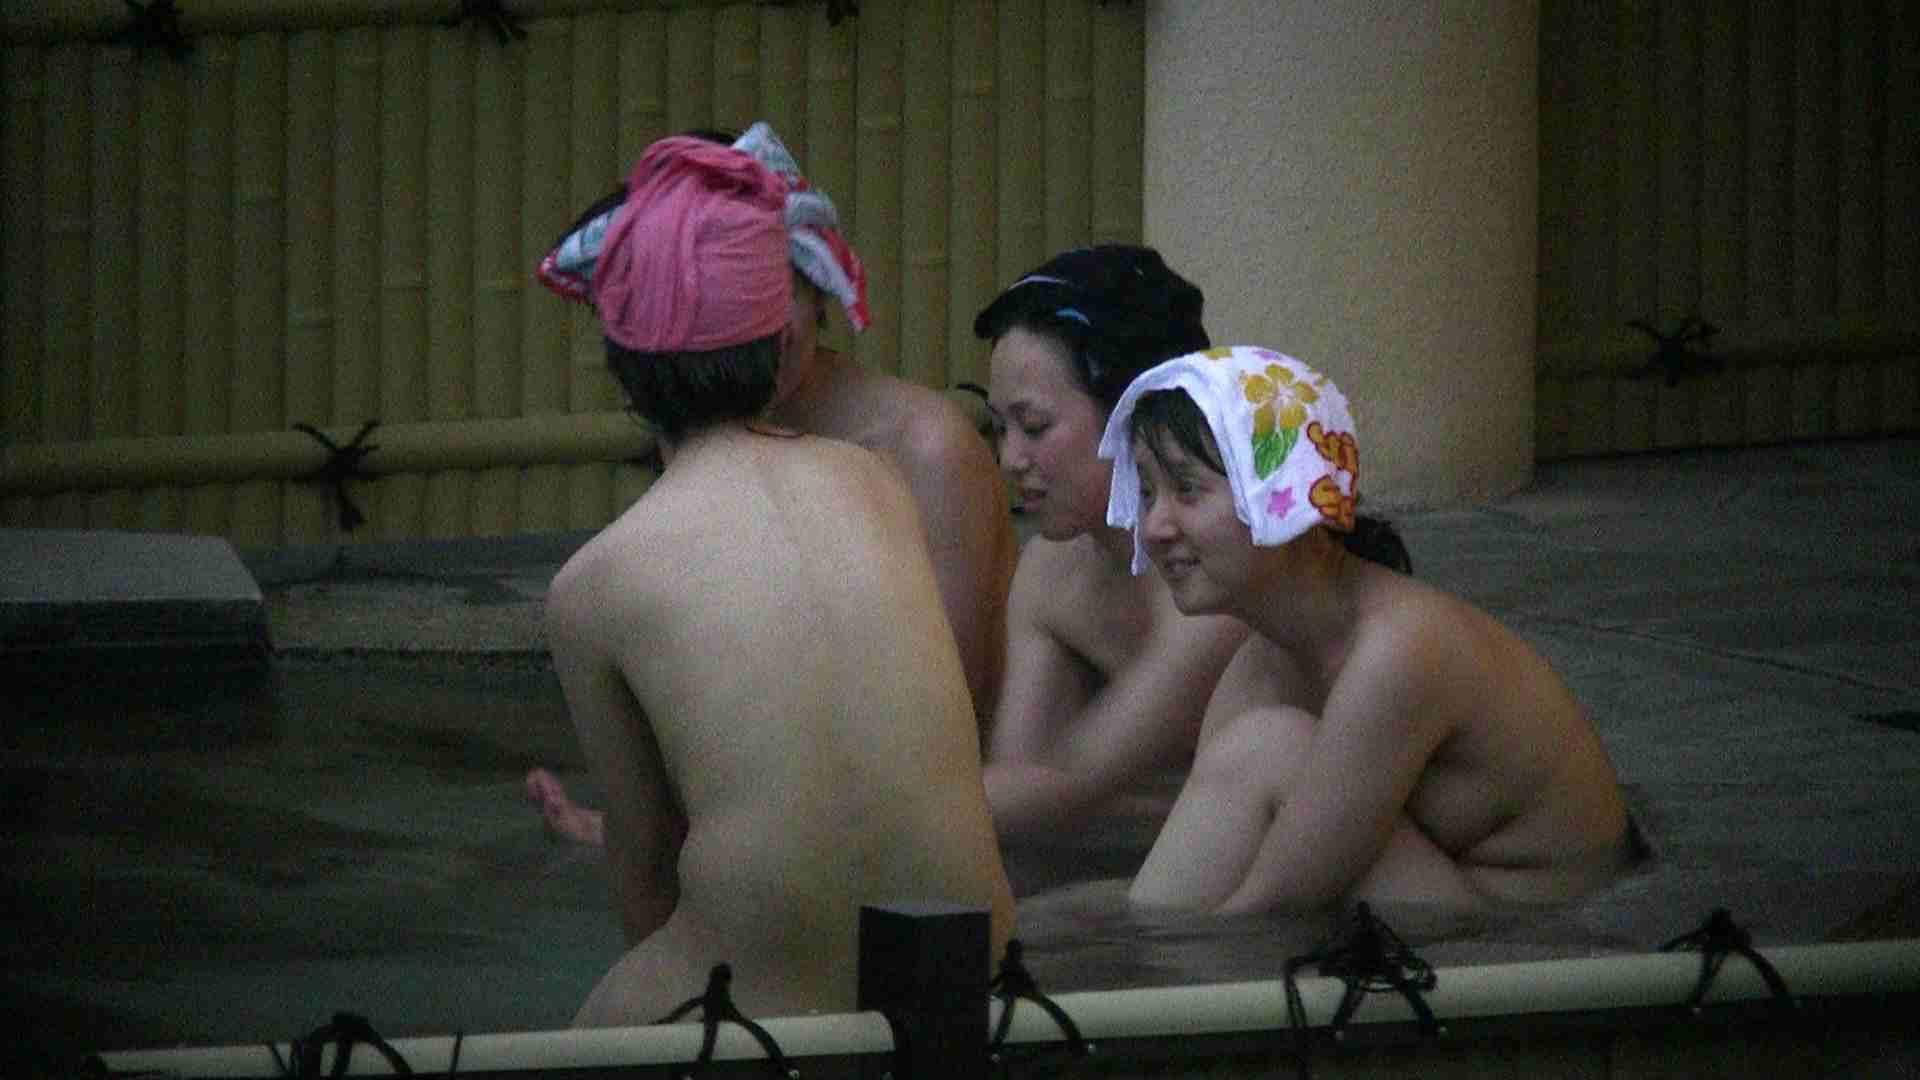 Aquaな露天風呂Vol.149 露天風呂突入 オマンコ動画キャプチャ 101pic 44